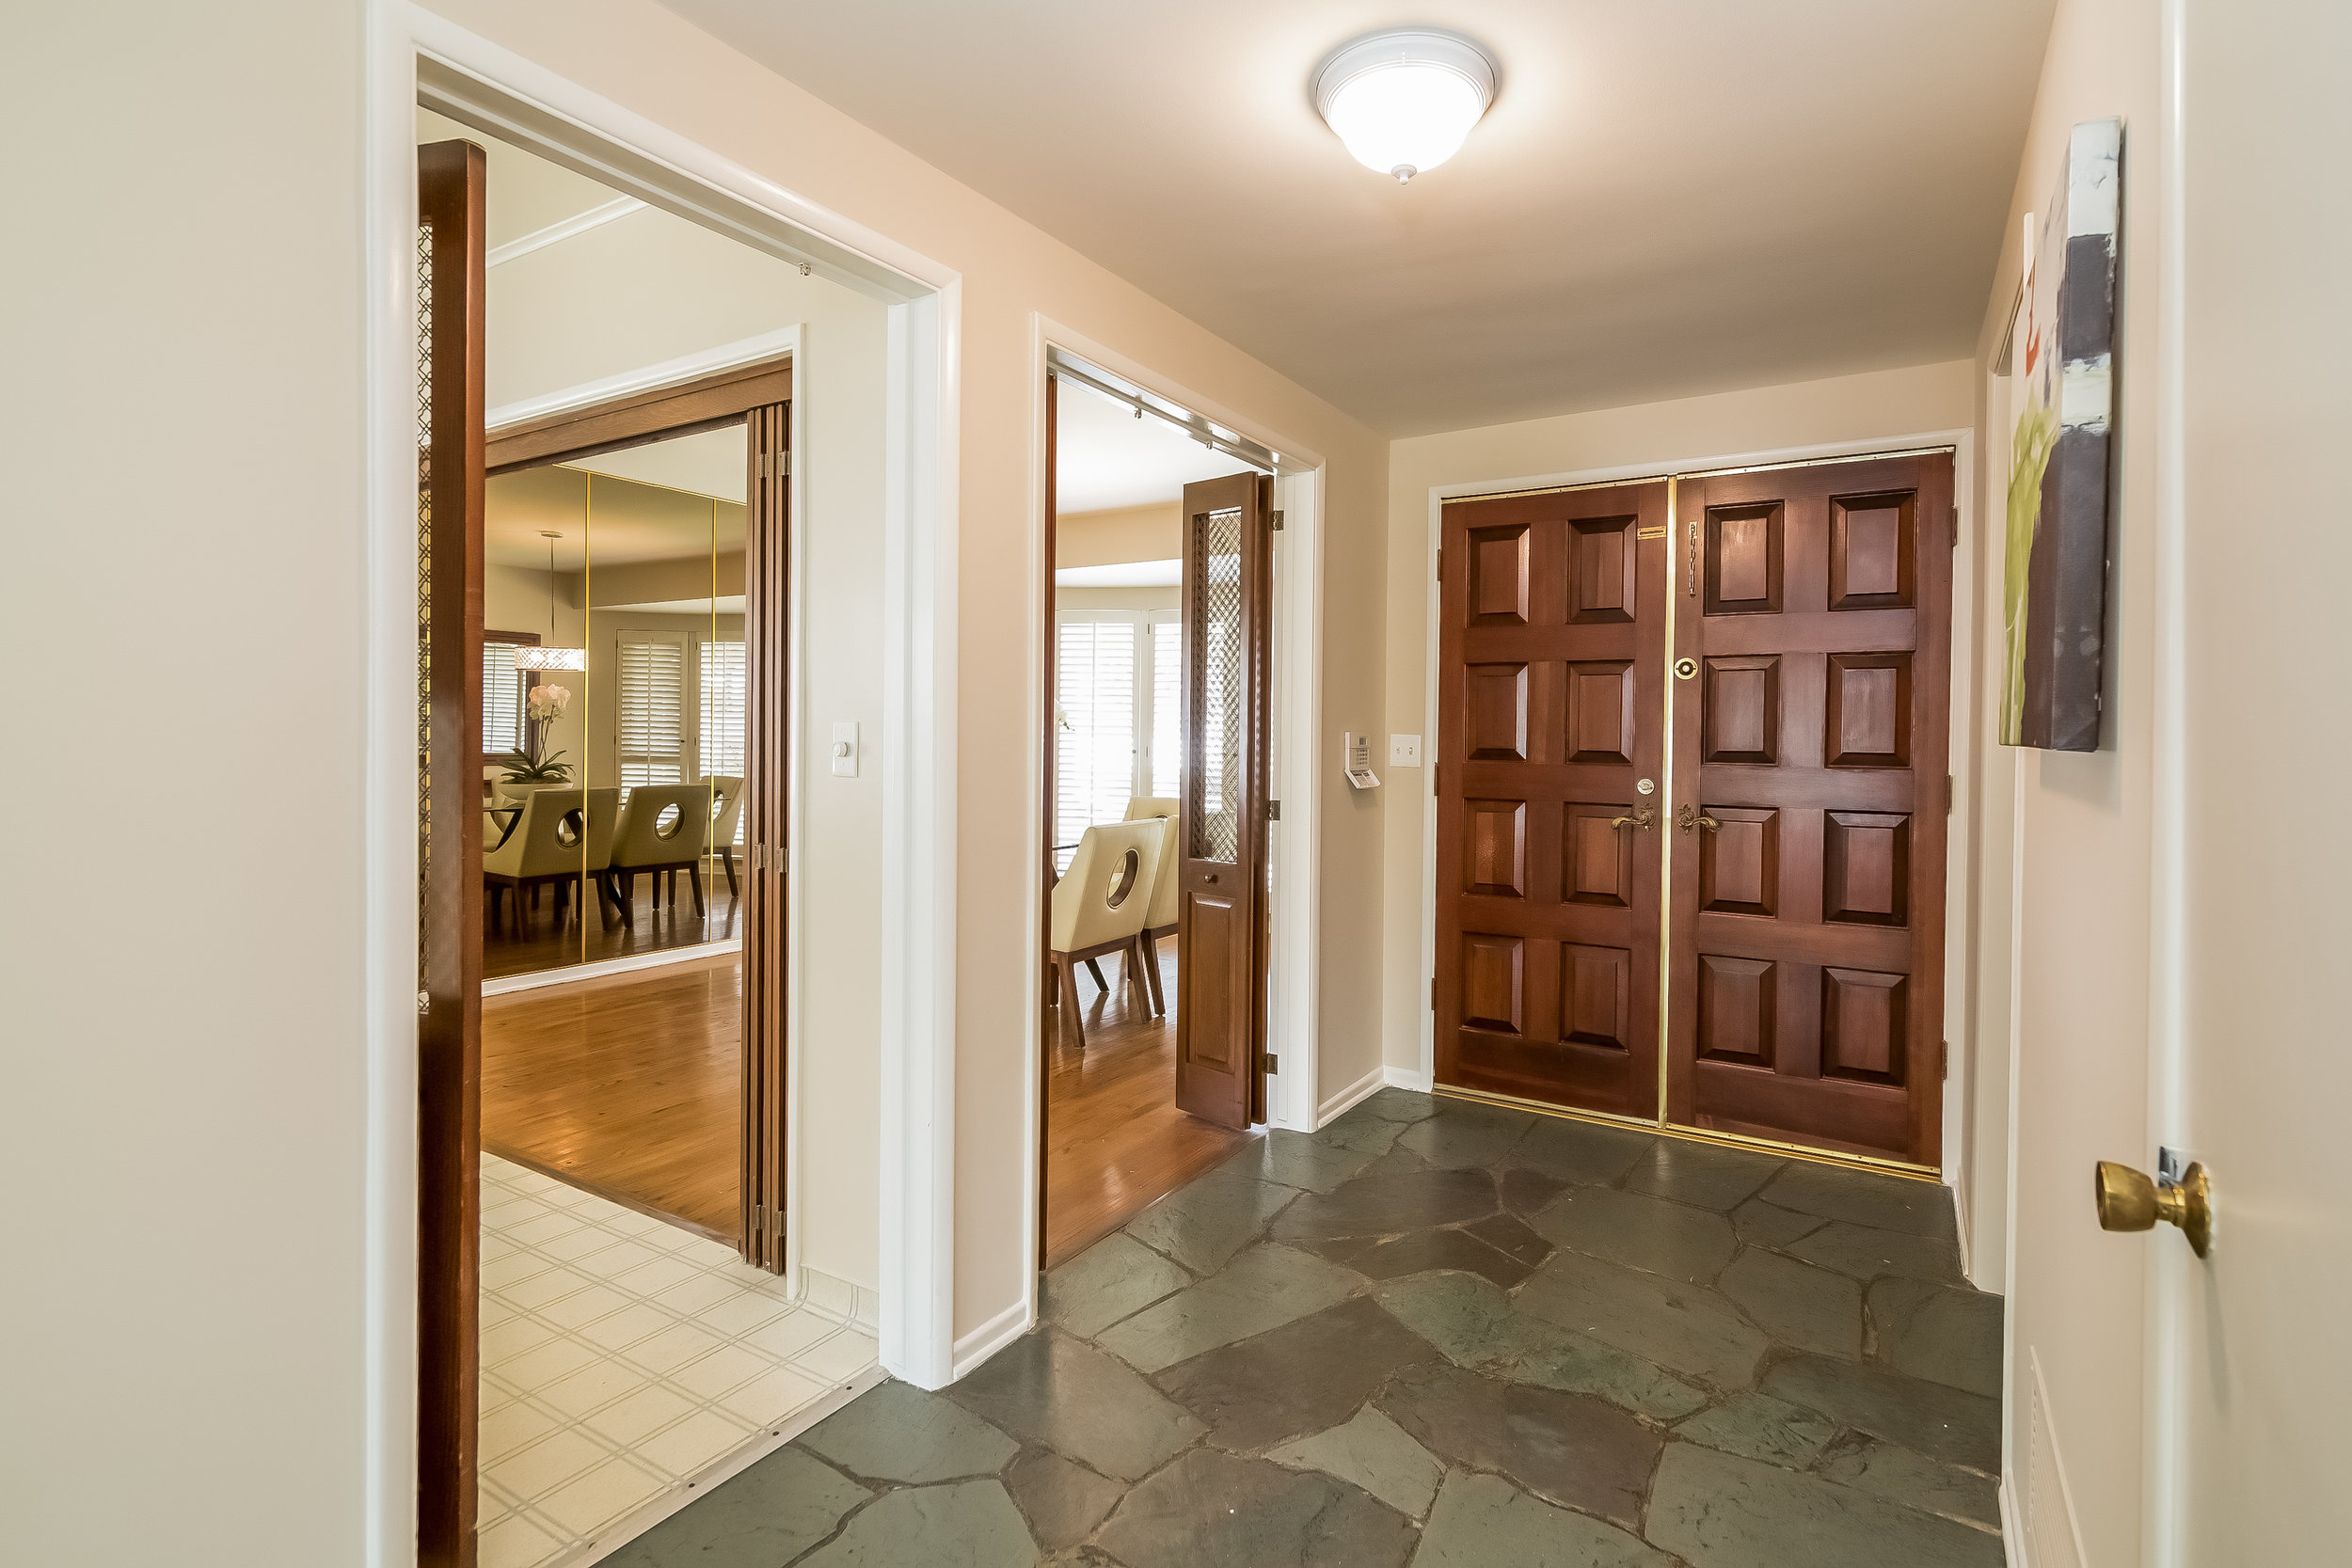 007-Foyer-2805408-large.jpg